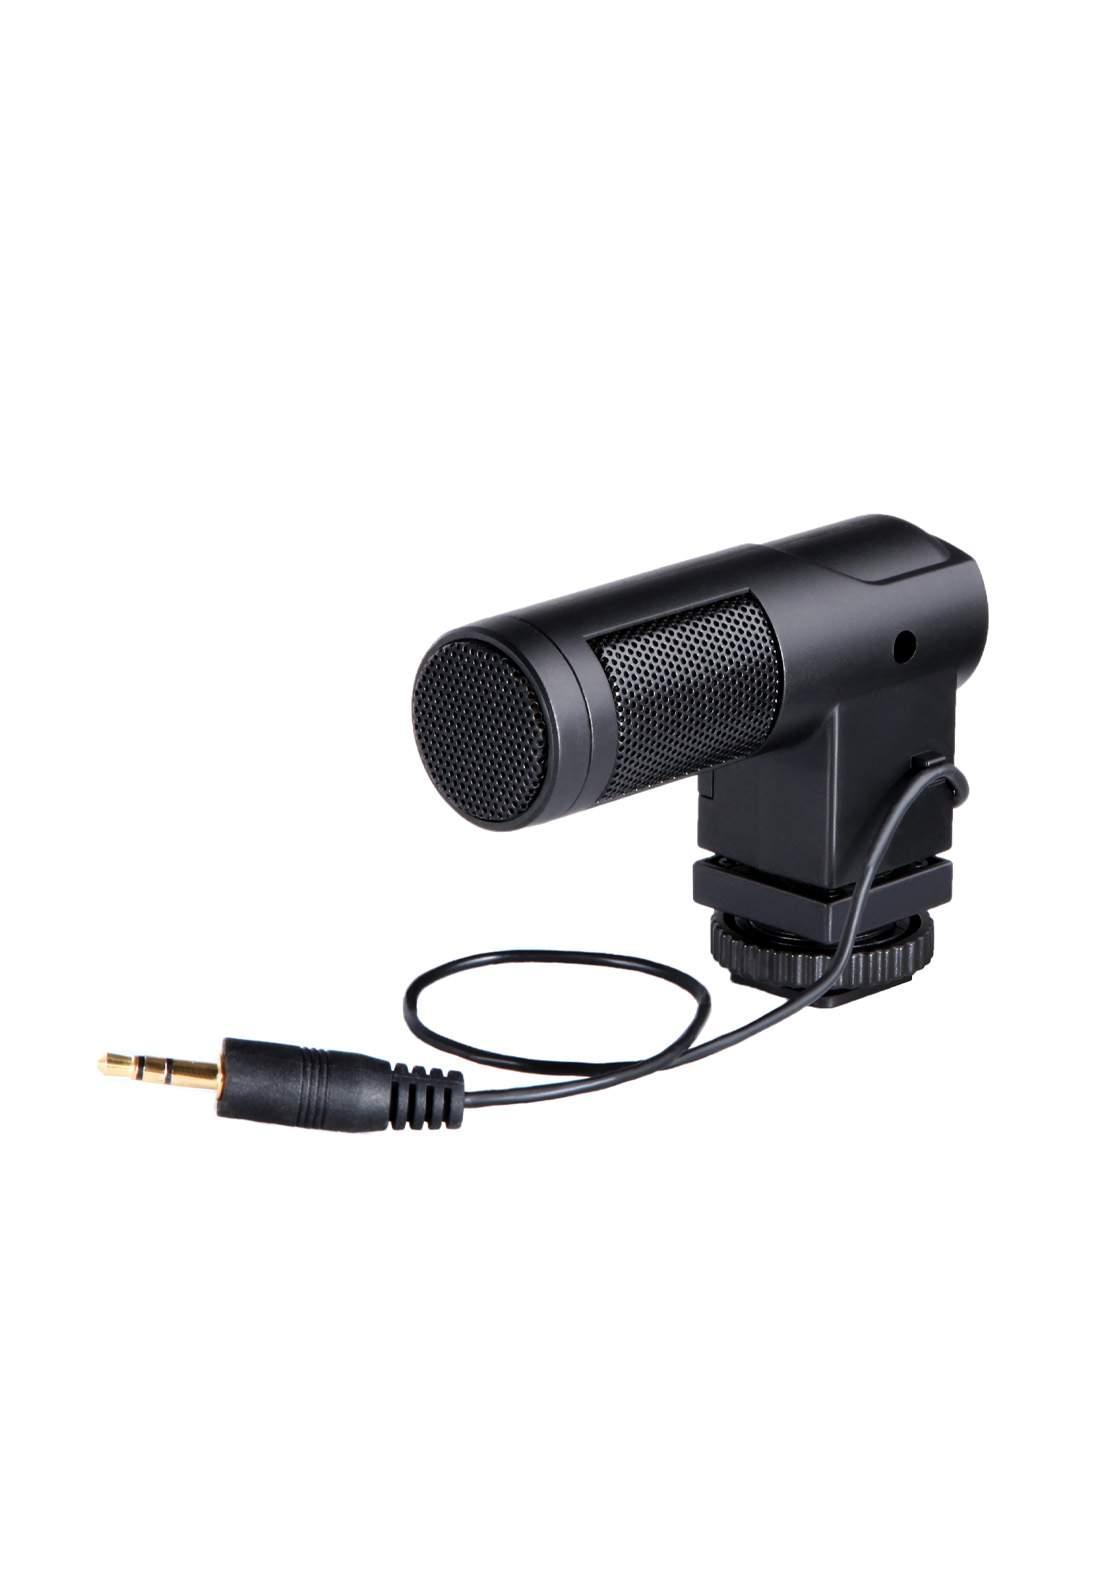 Boya BY-V01 Condenser Microphone - Black مايكروفون